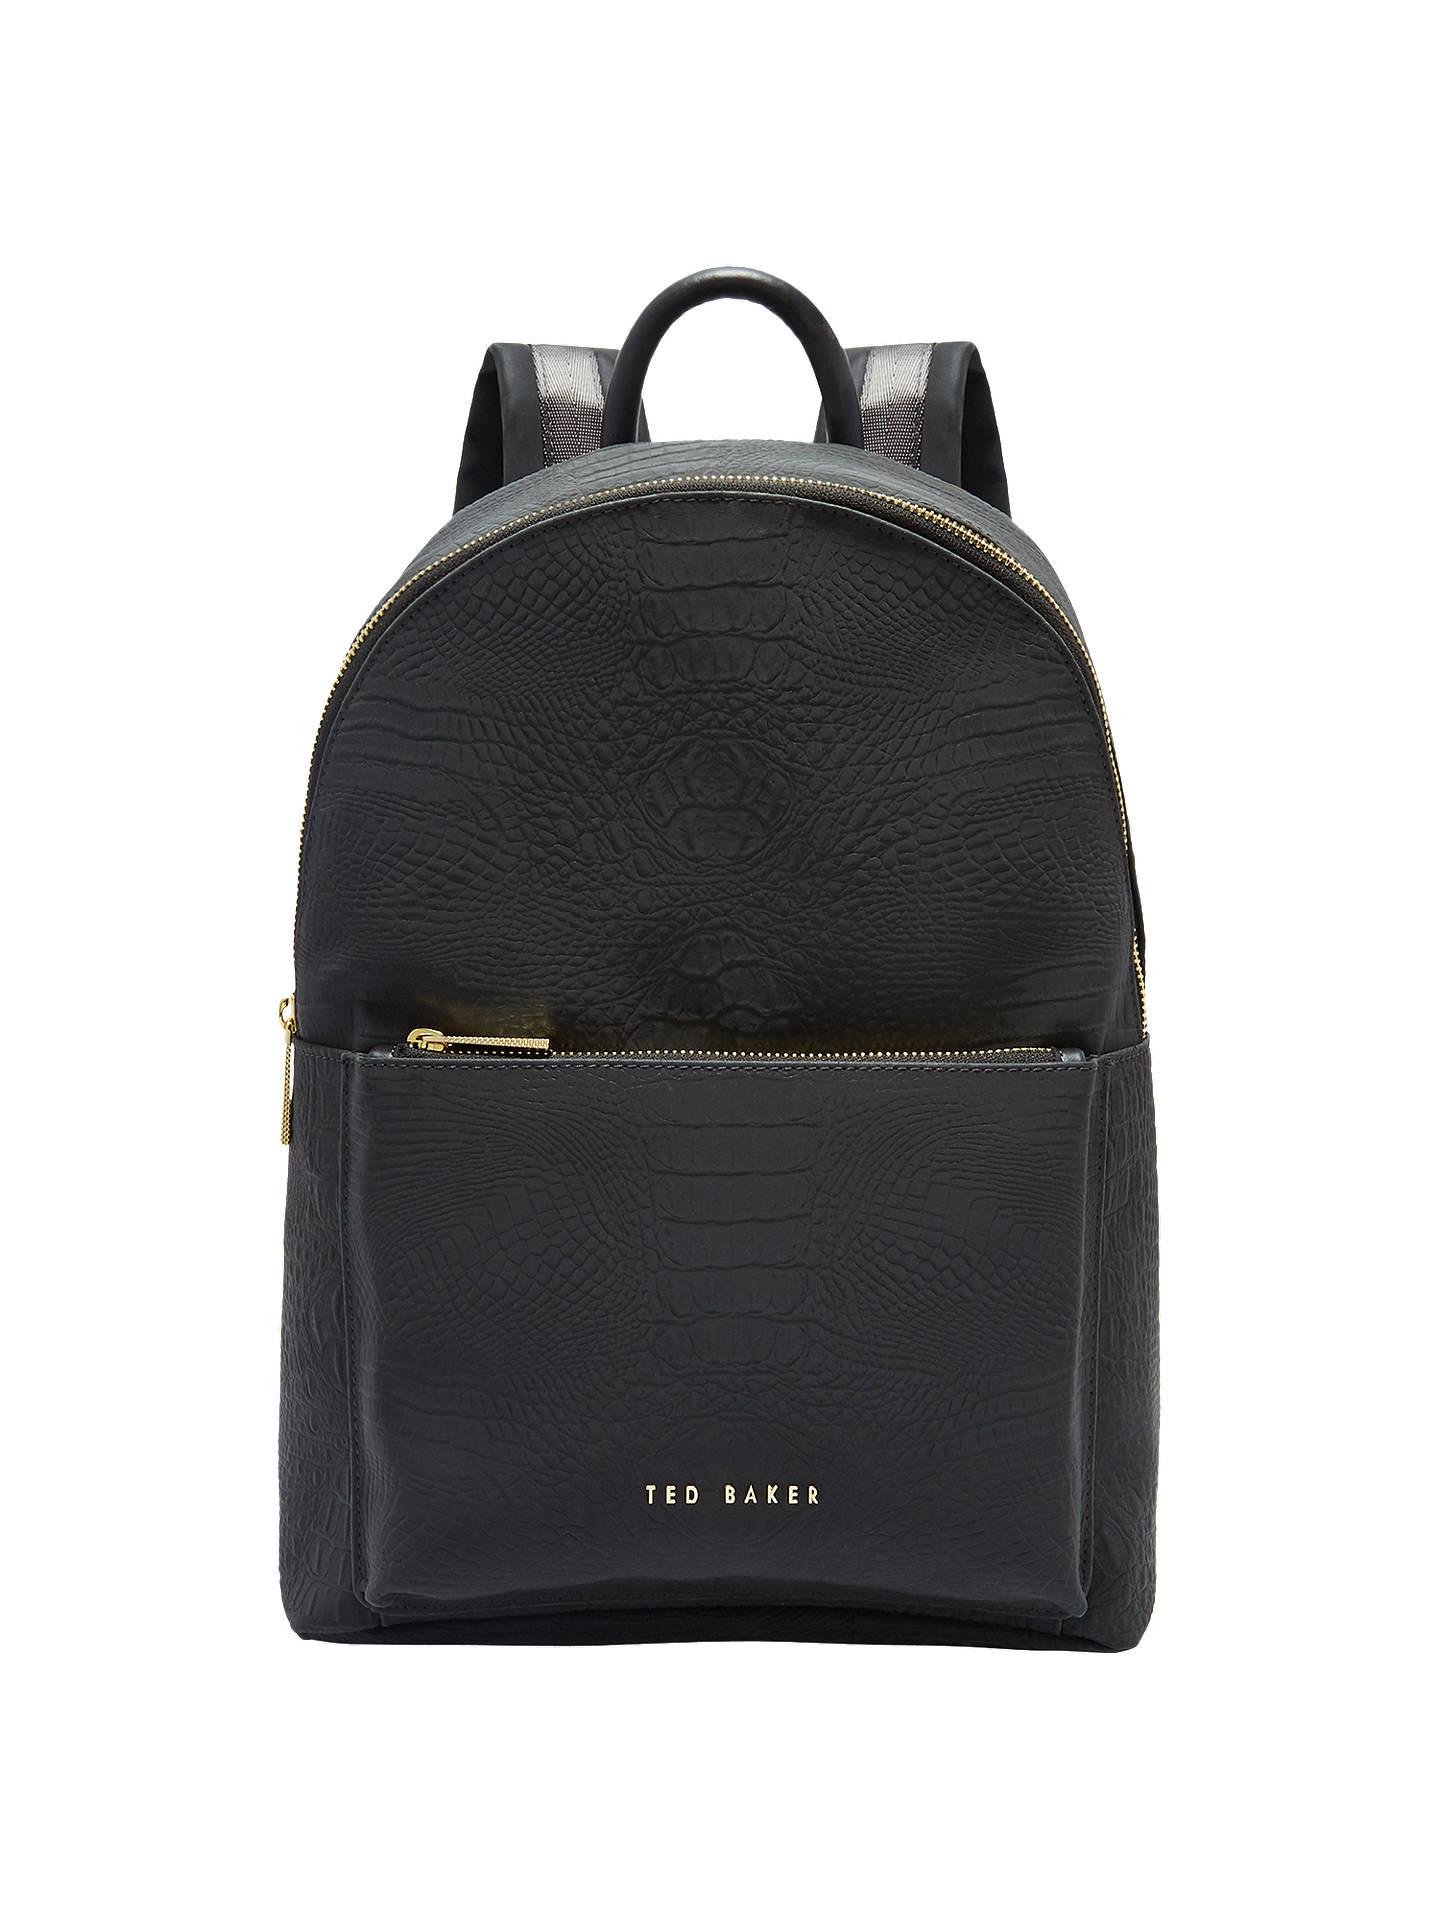 54232e1a32 Buy Ted Baker Creaala Leather Croc Effect Backpack